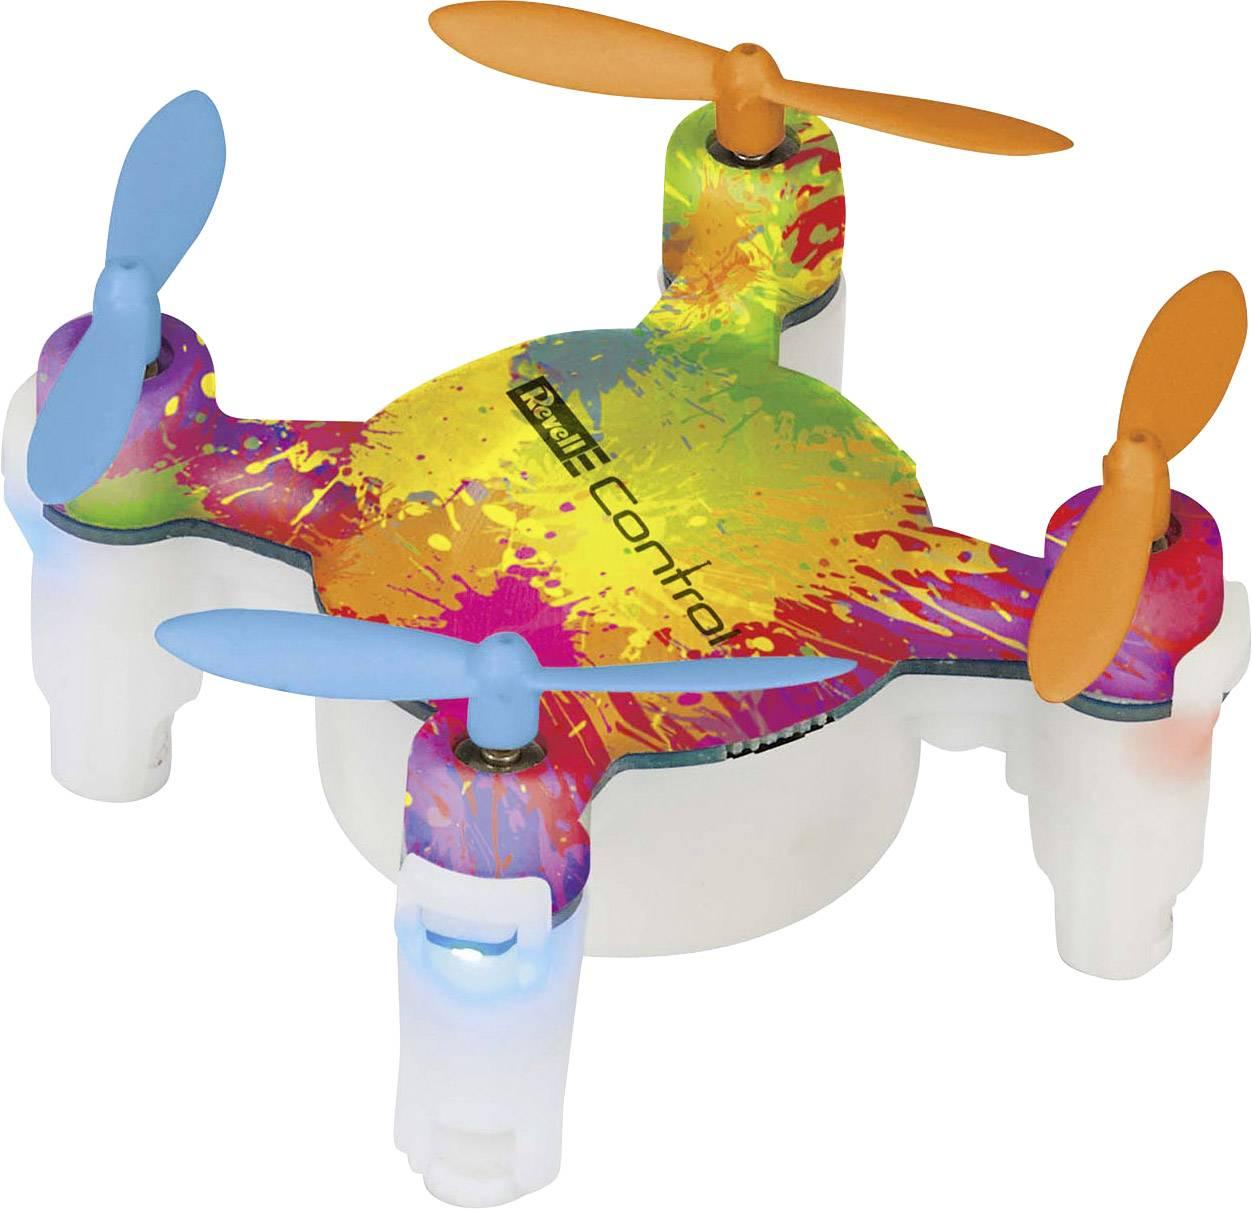 Dron pro začátečníky Revell Control Nano Quad Fun, RtF, barevný